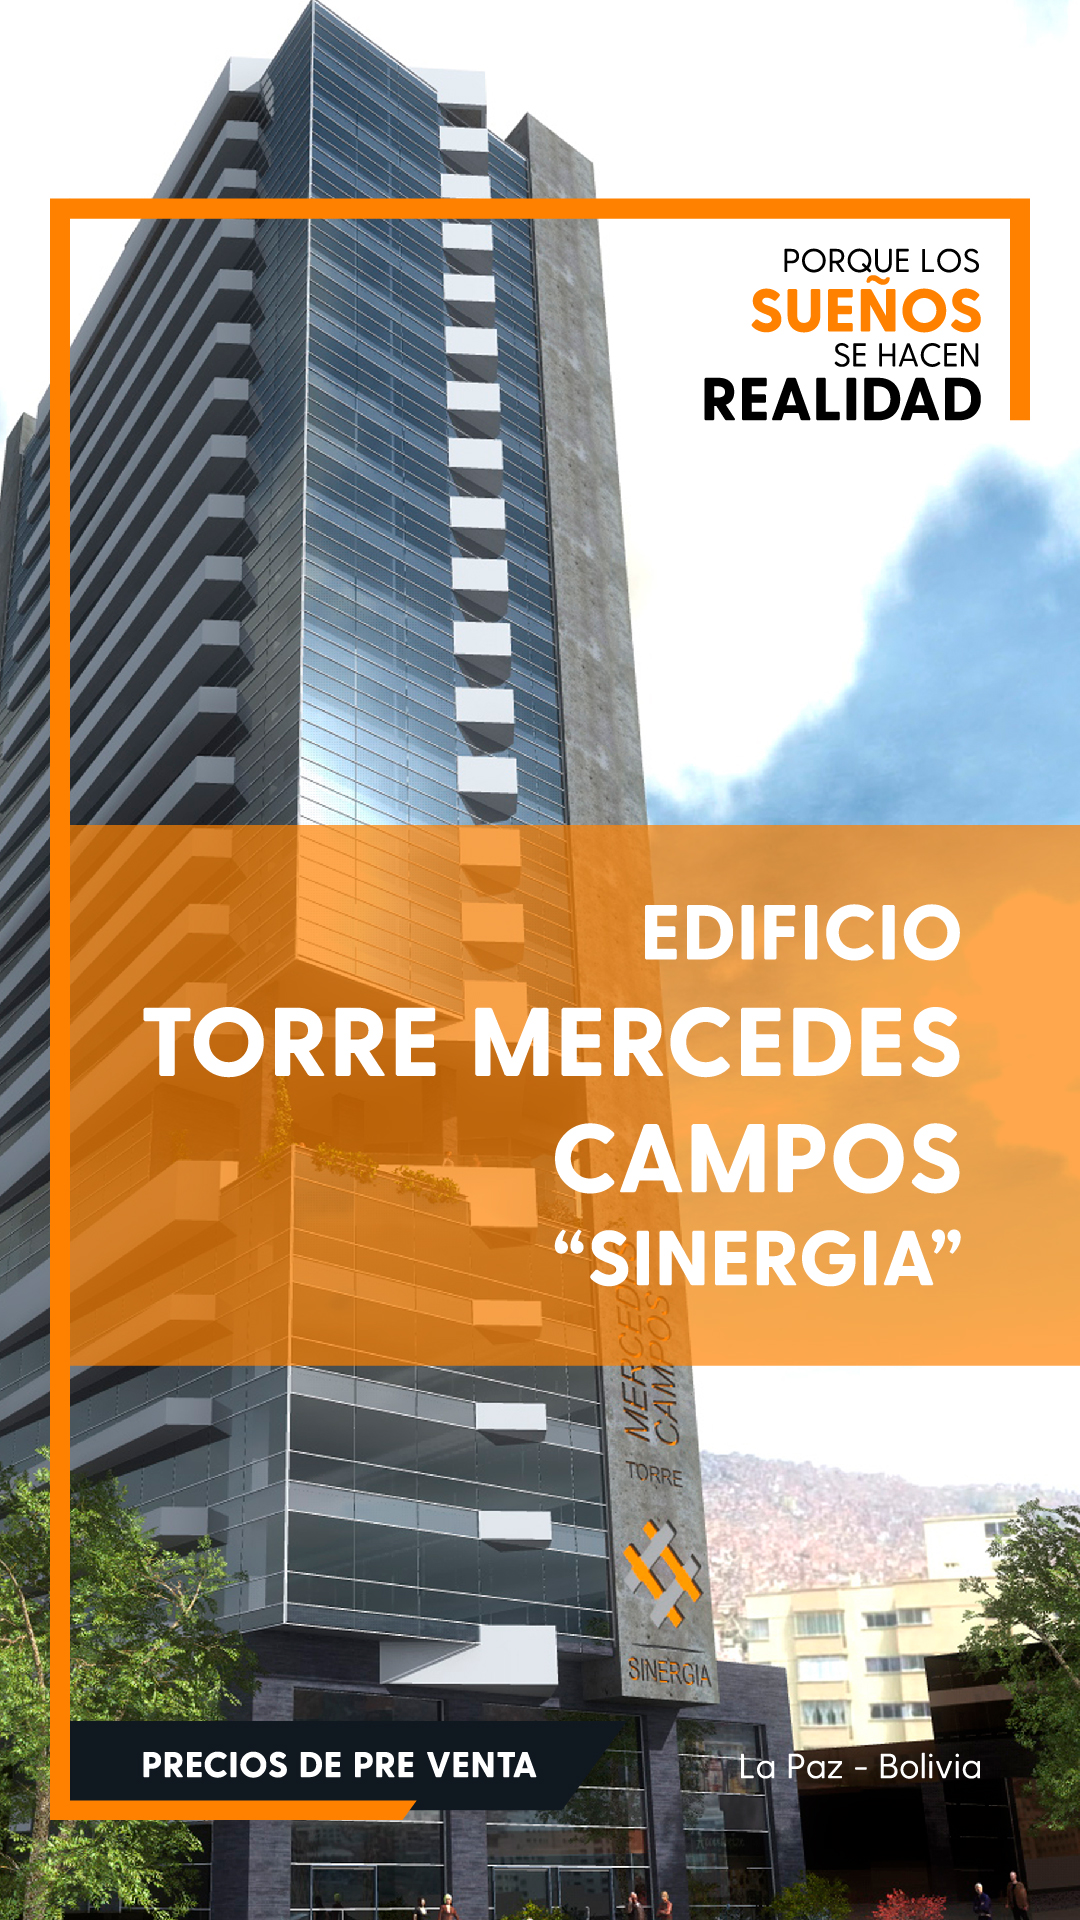 Torre Mercedes Campos Sinergia